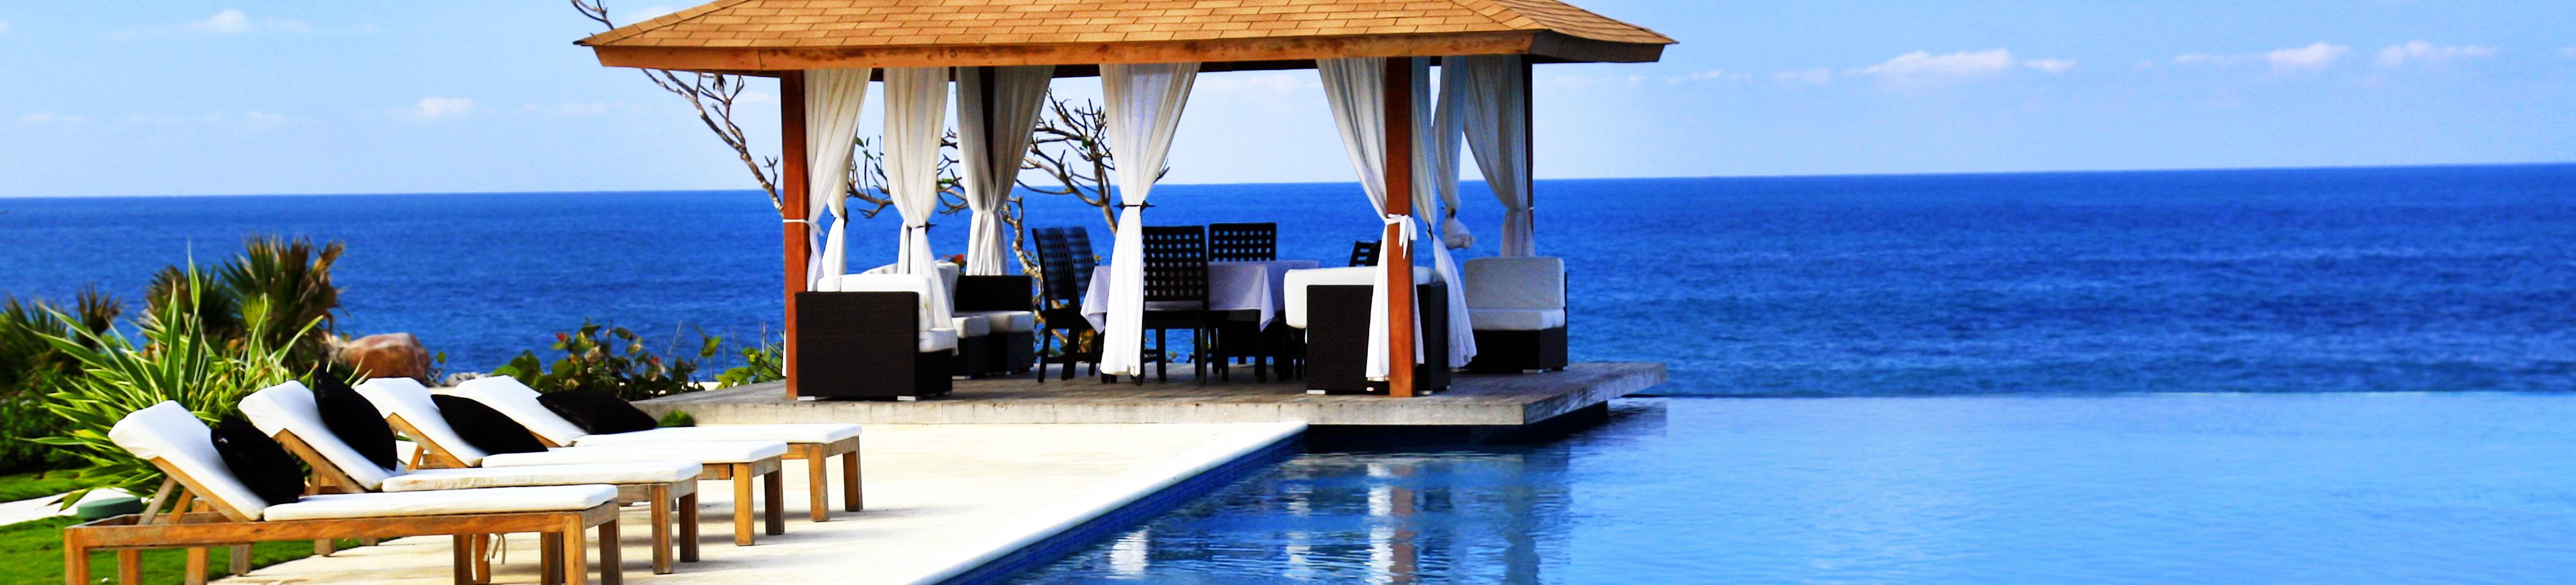 Les hôtels à Cuba